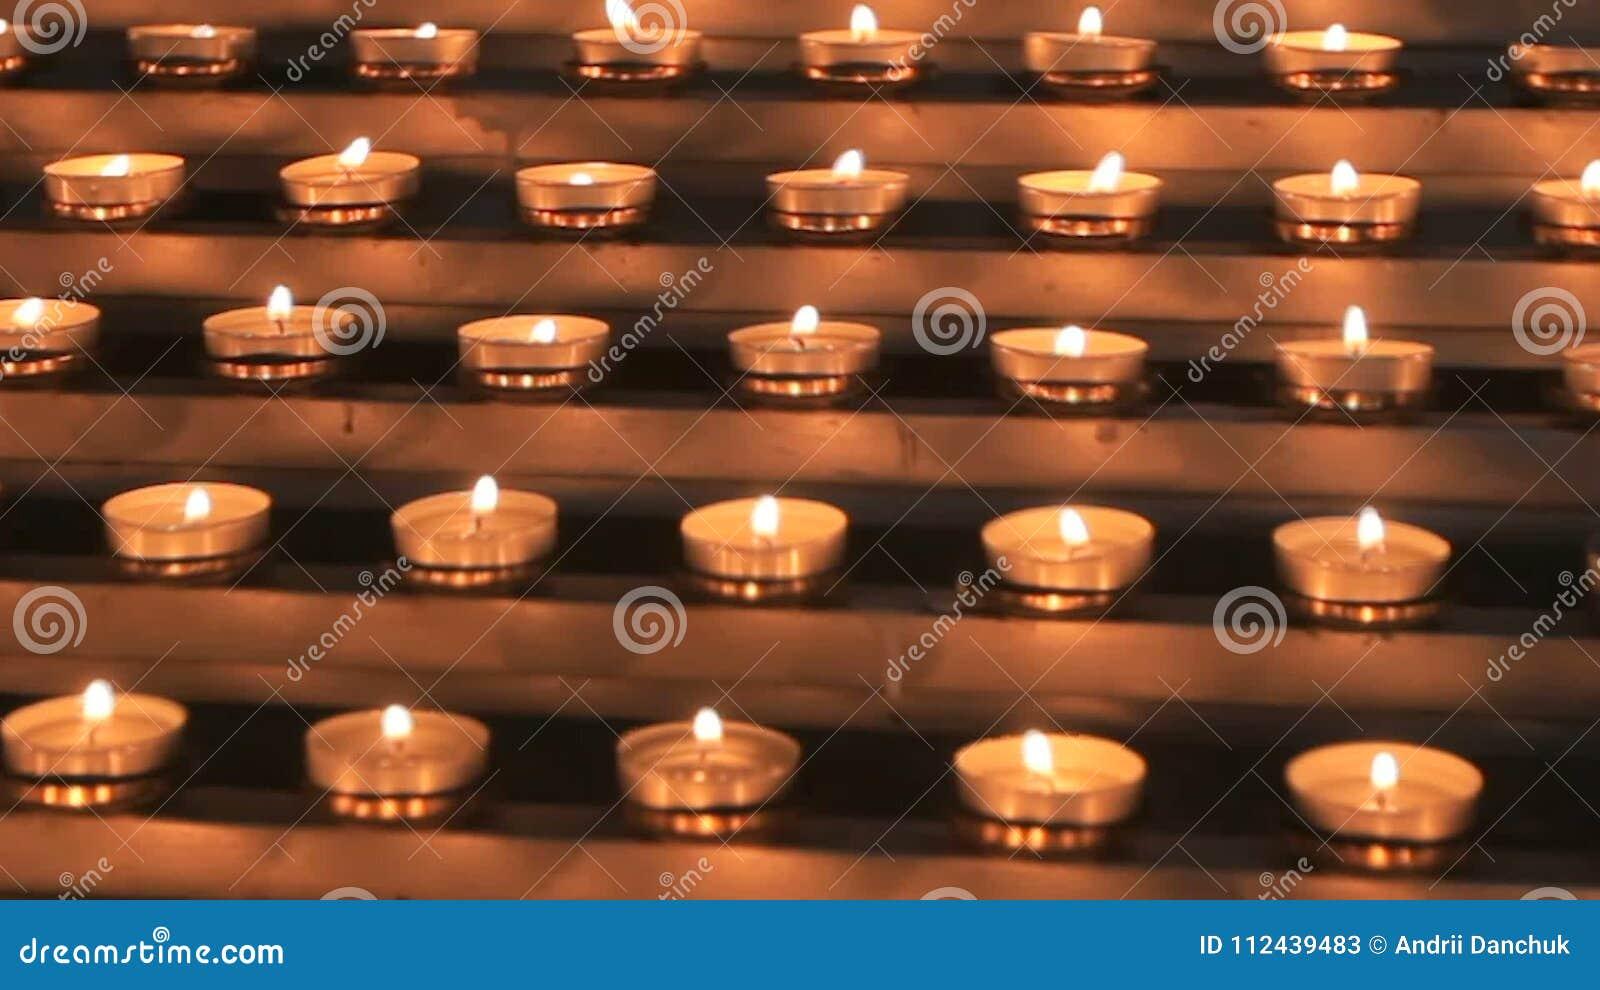 Many small church candles burn at the altar  Bright, celebration